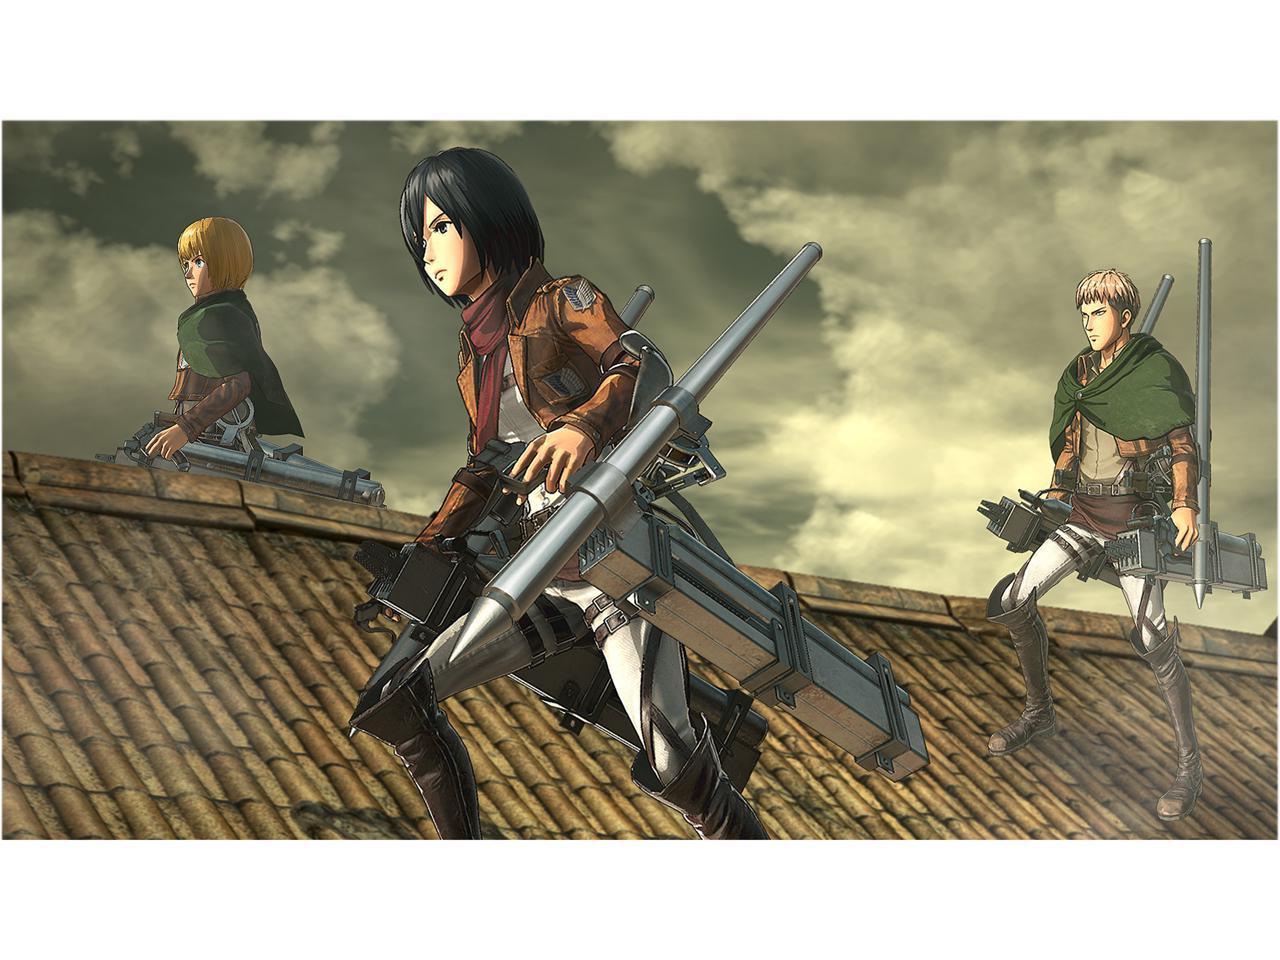 Attack on Titan 2: Final Battle - Nintendo Switch - Newegg.com